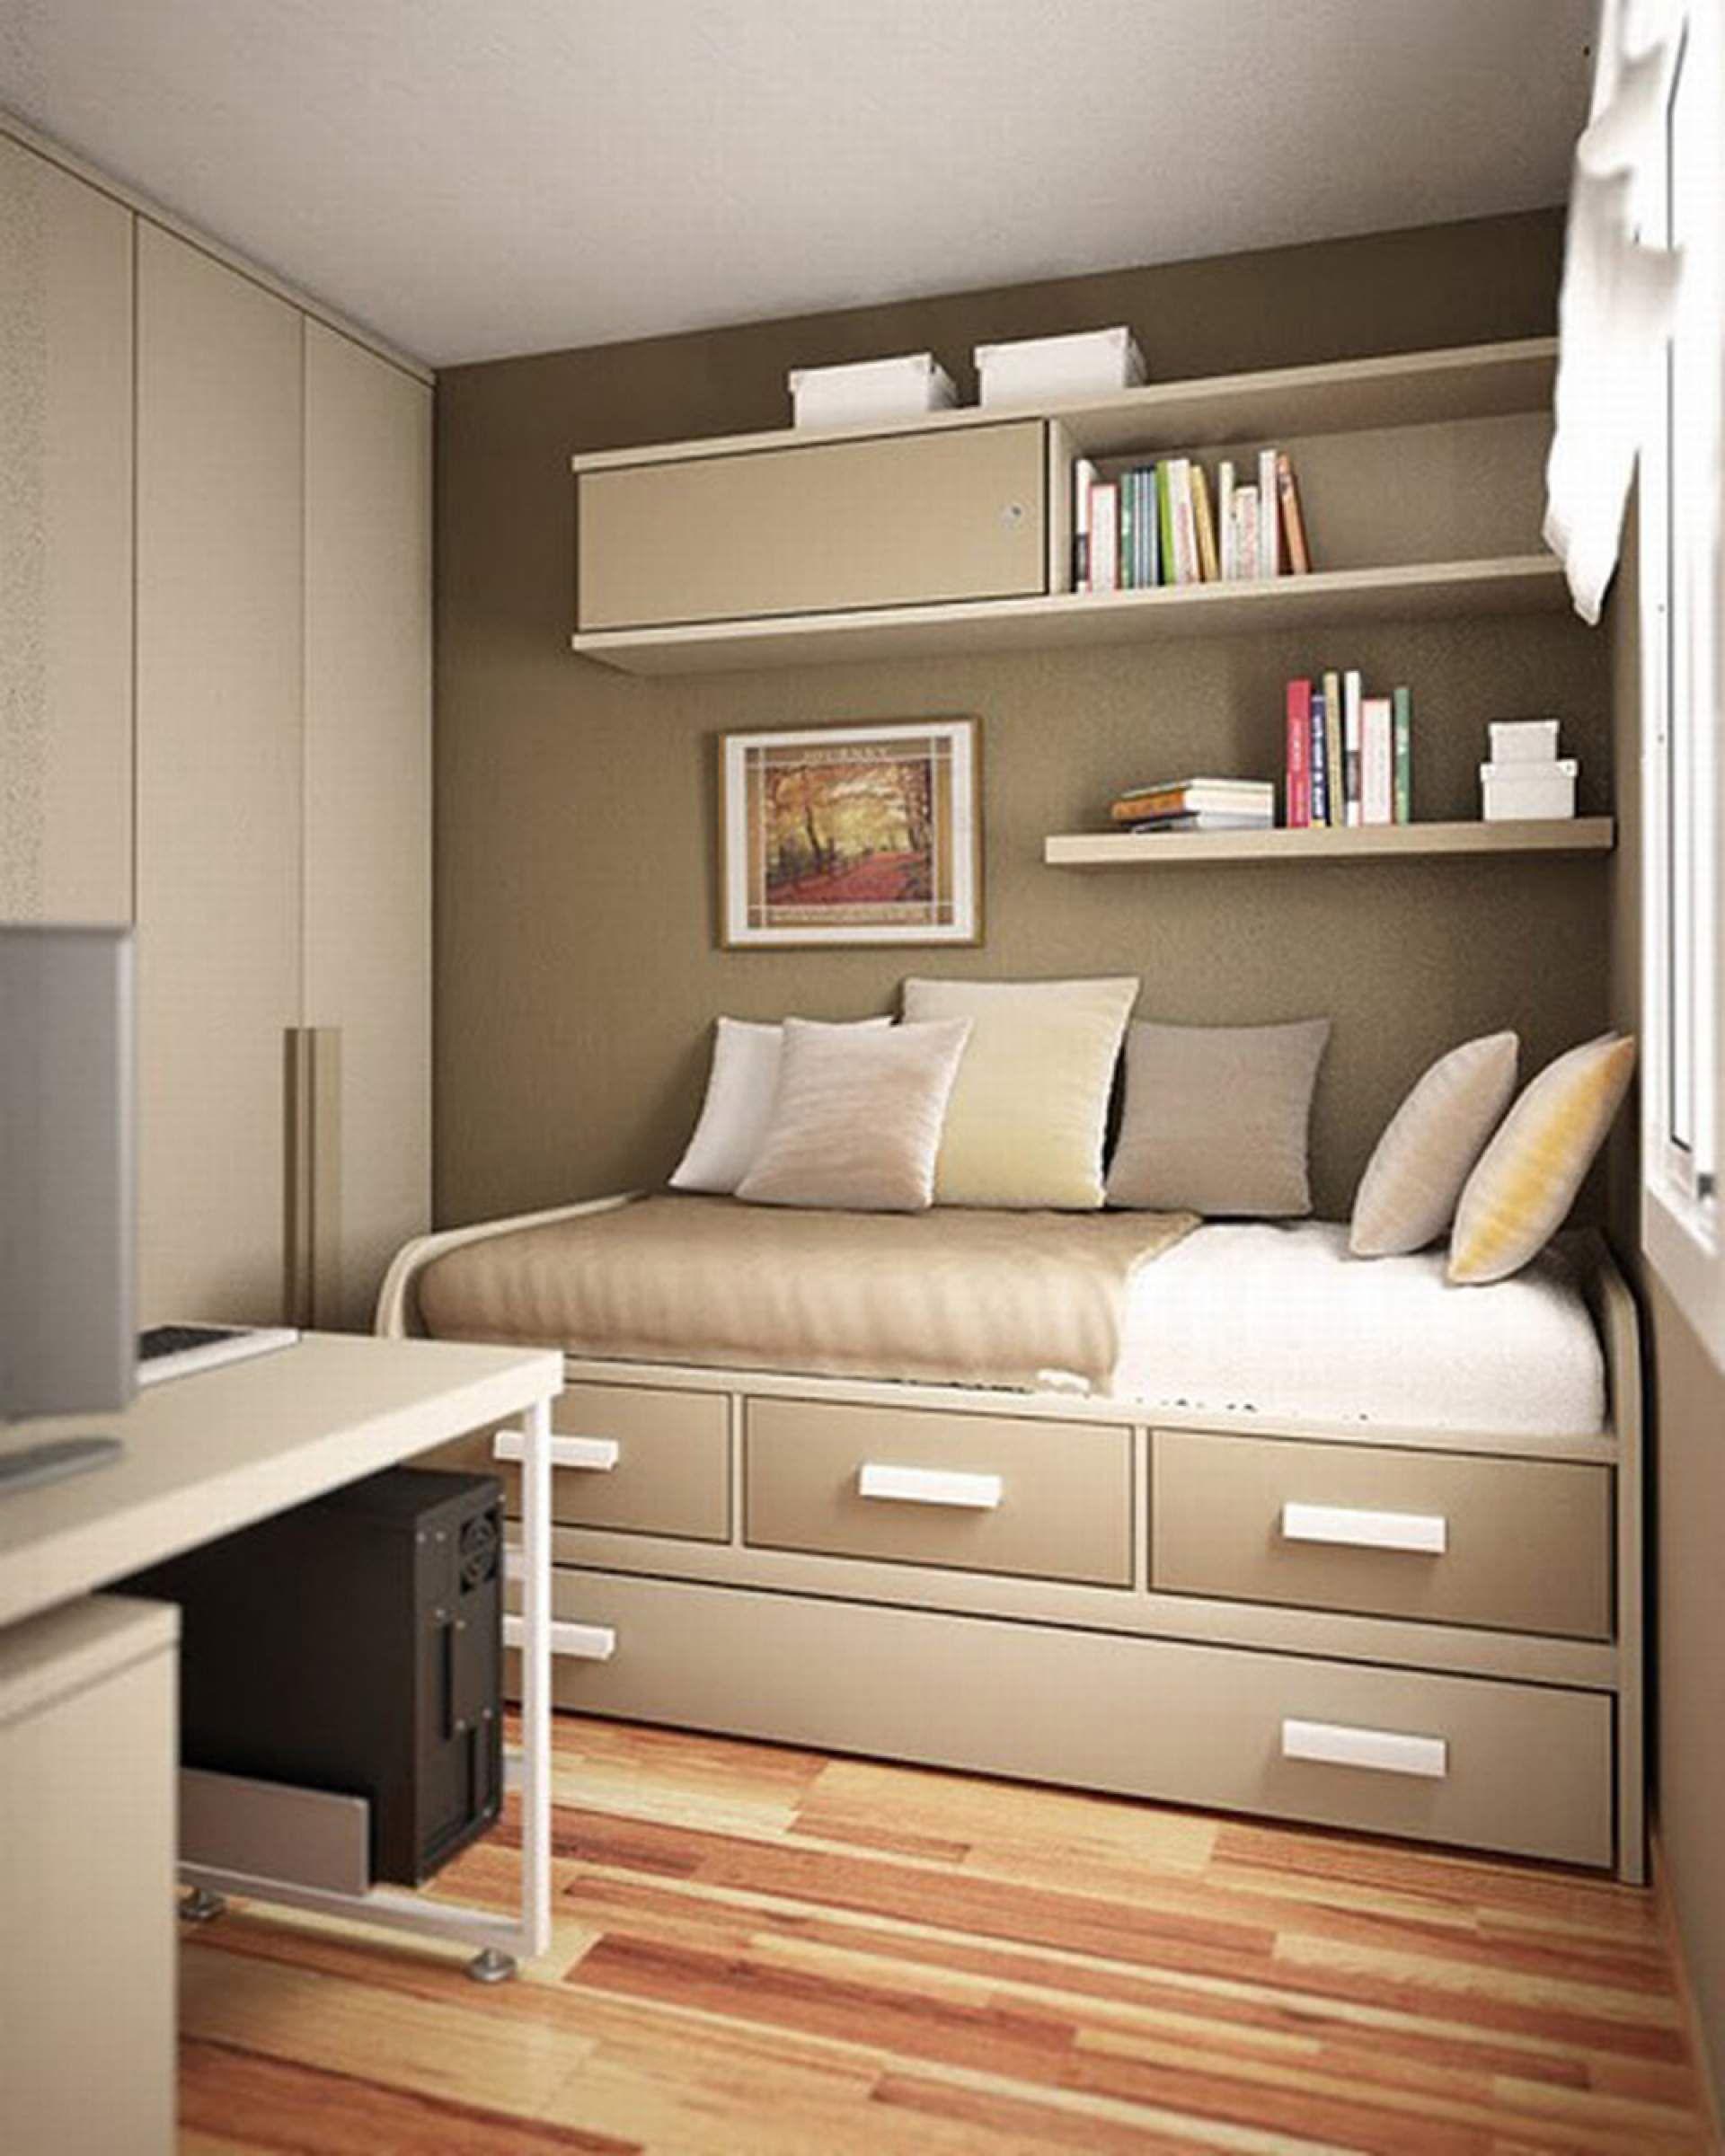 Bedroom Ideas Natural Bedroom Blue And Brown Blue Bedroom Houzz